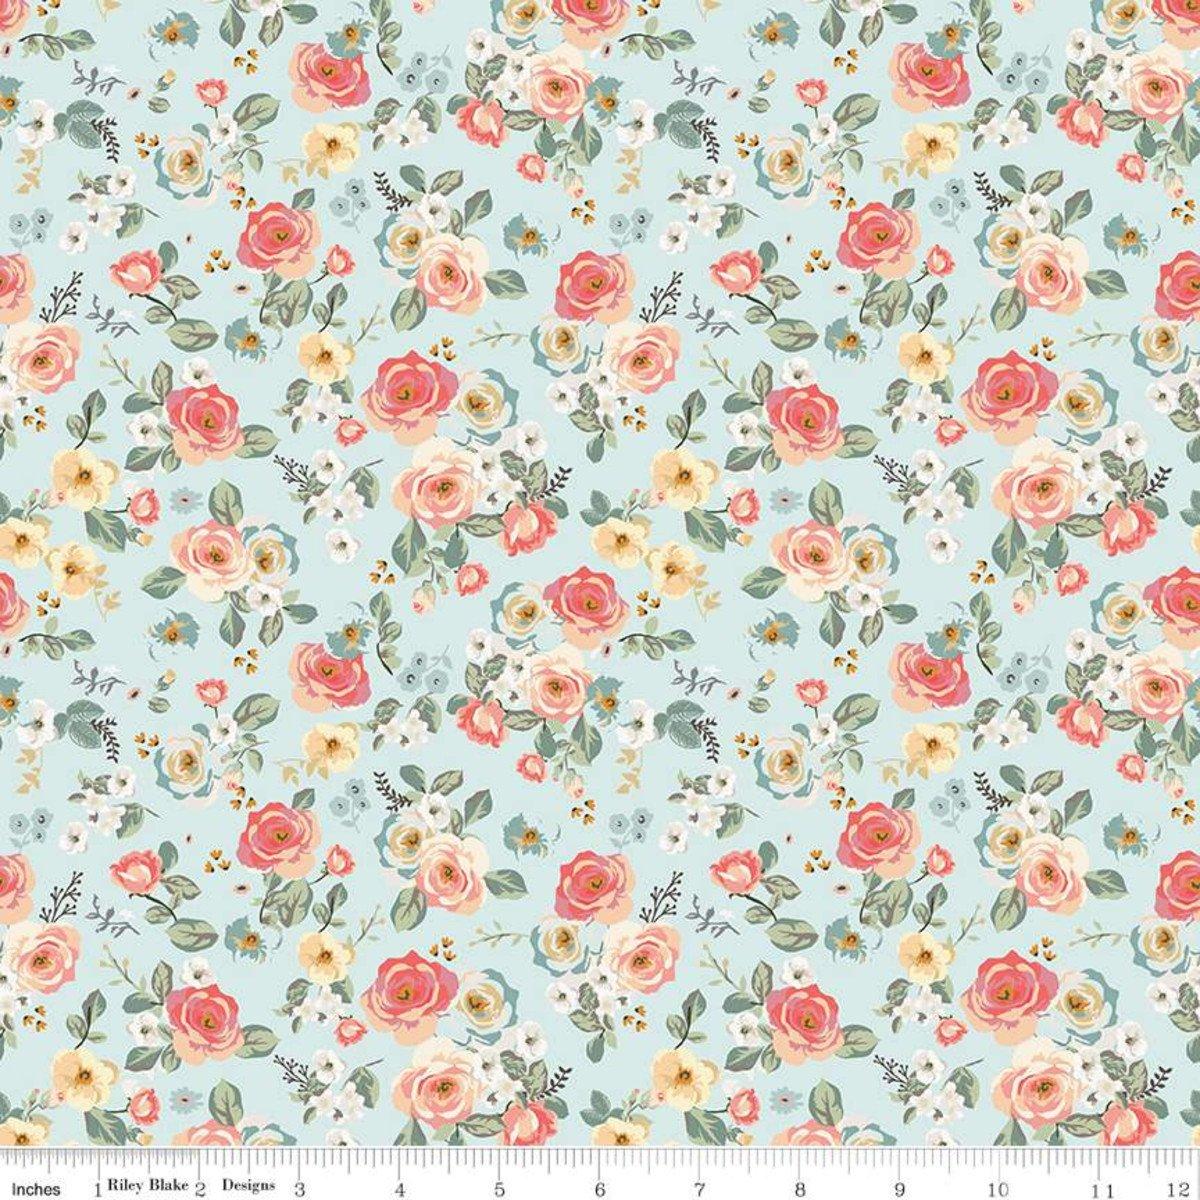 Floral - Aqua - Gingham Gardens - Mind's Eye - Riley Blake